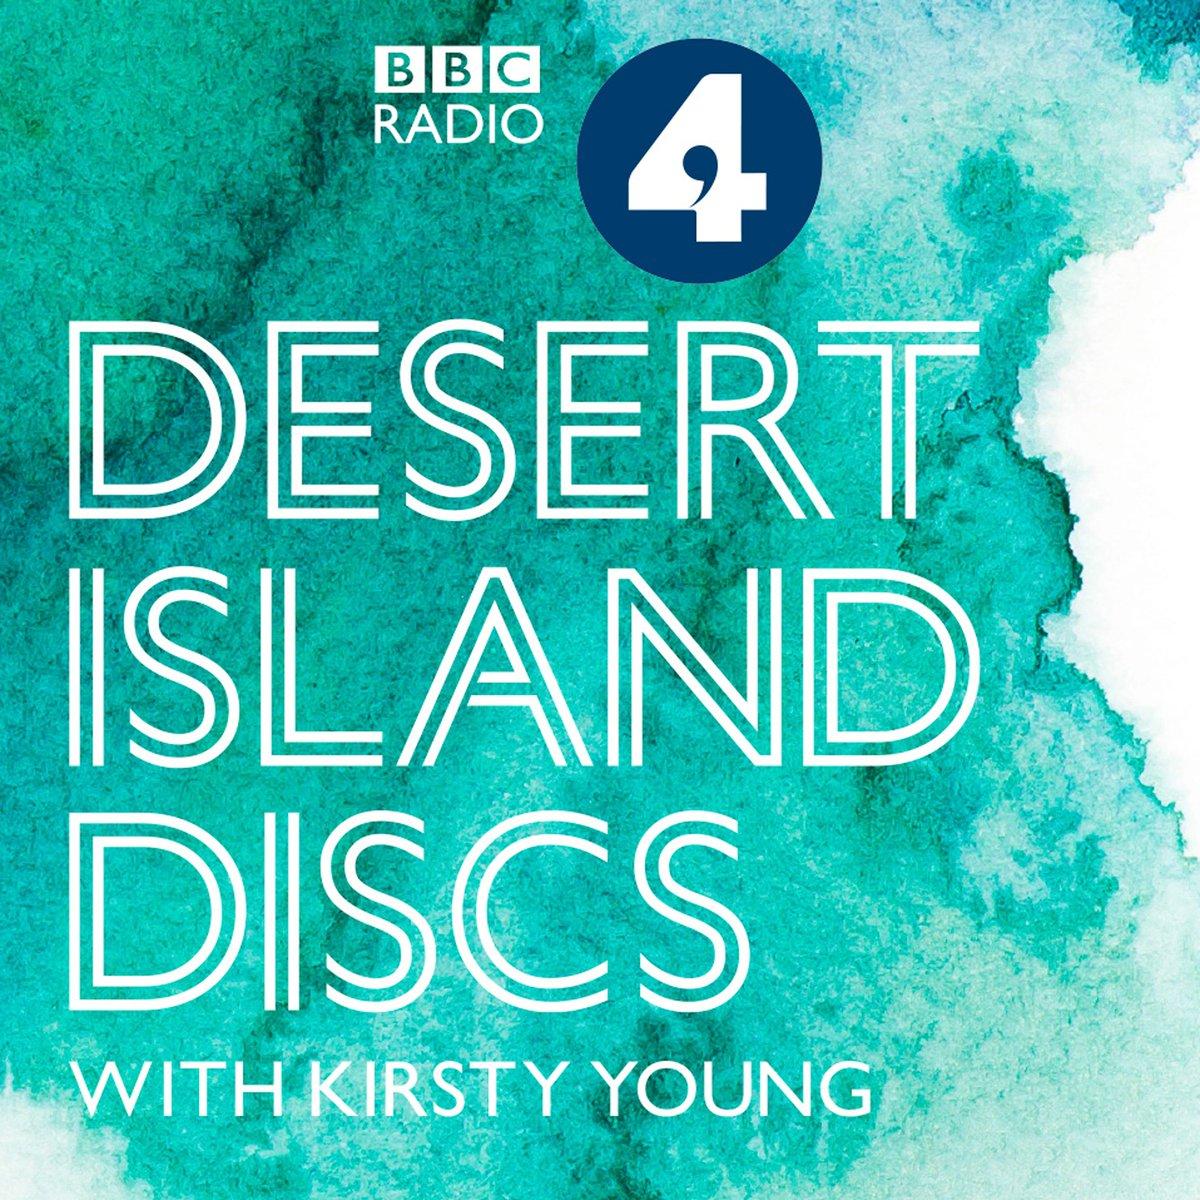 Radio  Desert Island Discs Iplayer Ed Sheeran